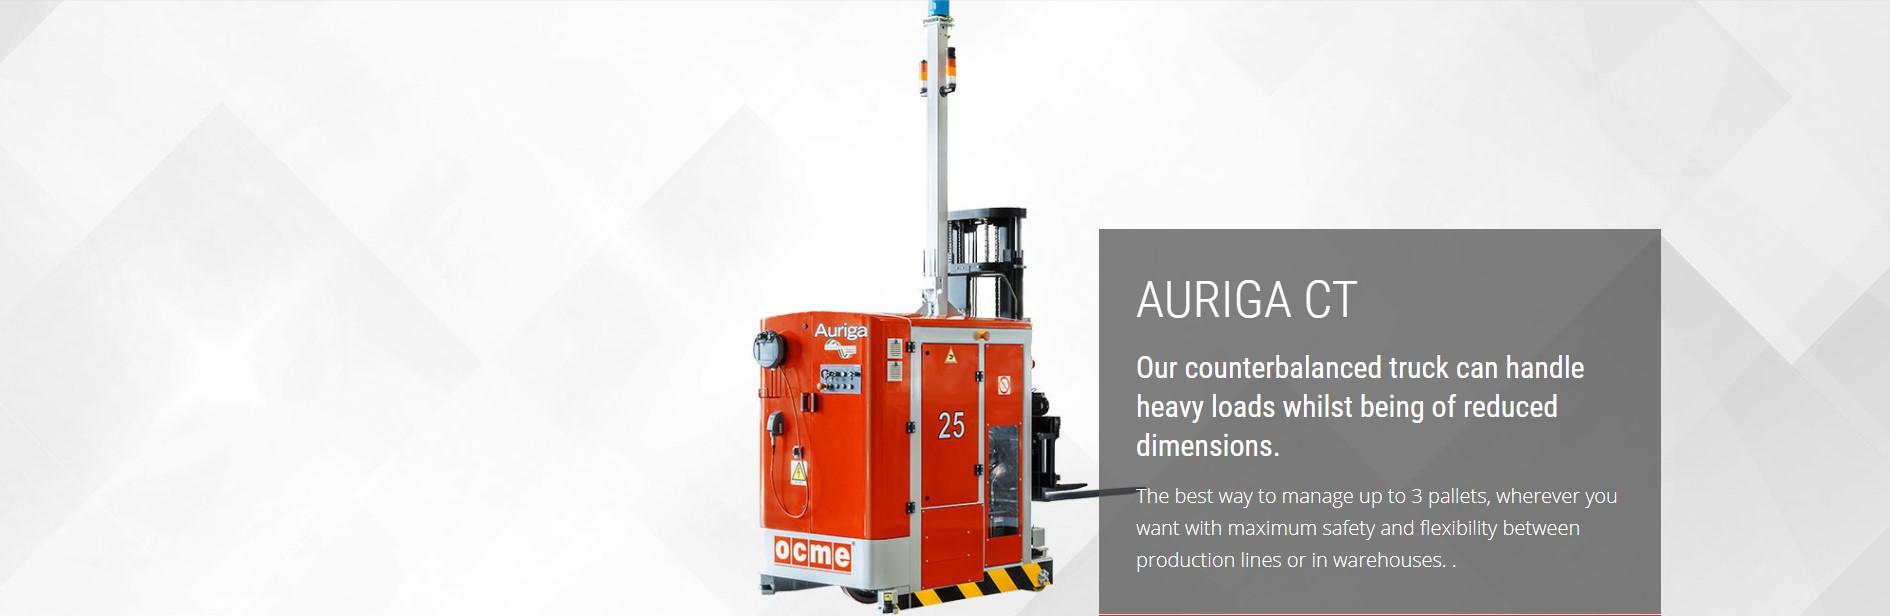 Auriga CT Laser Guided Vehicle